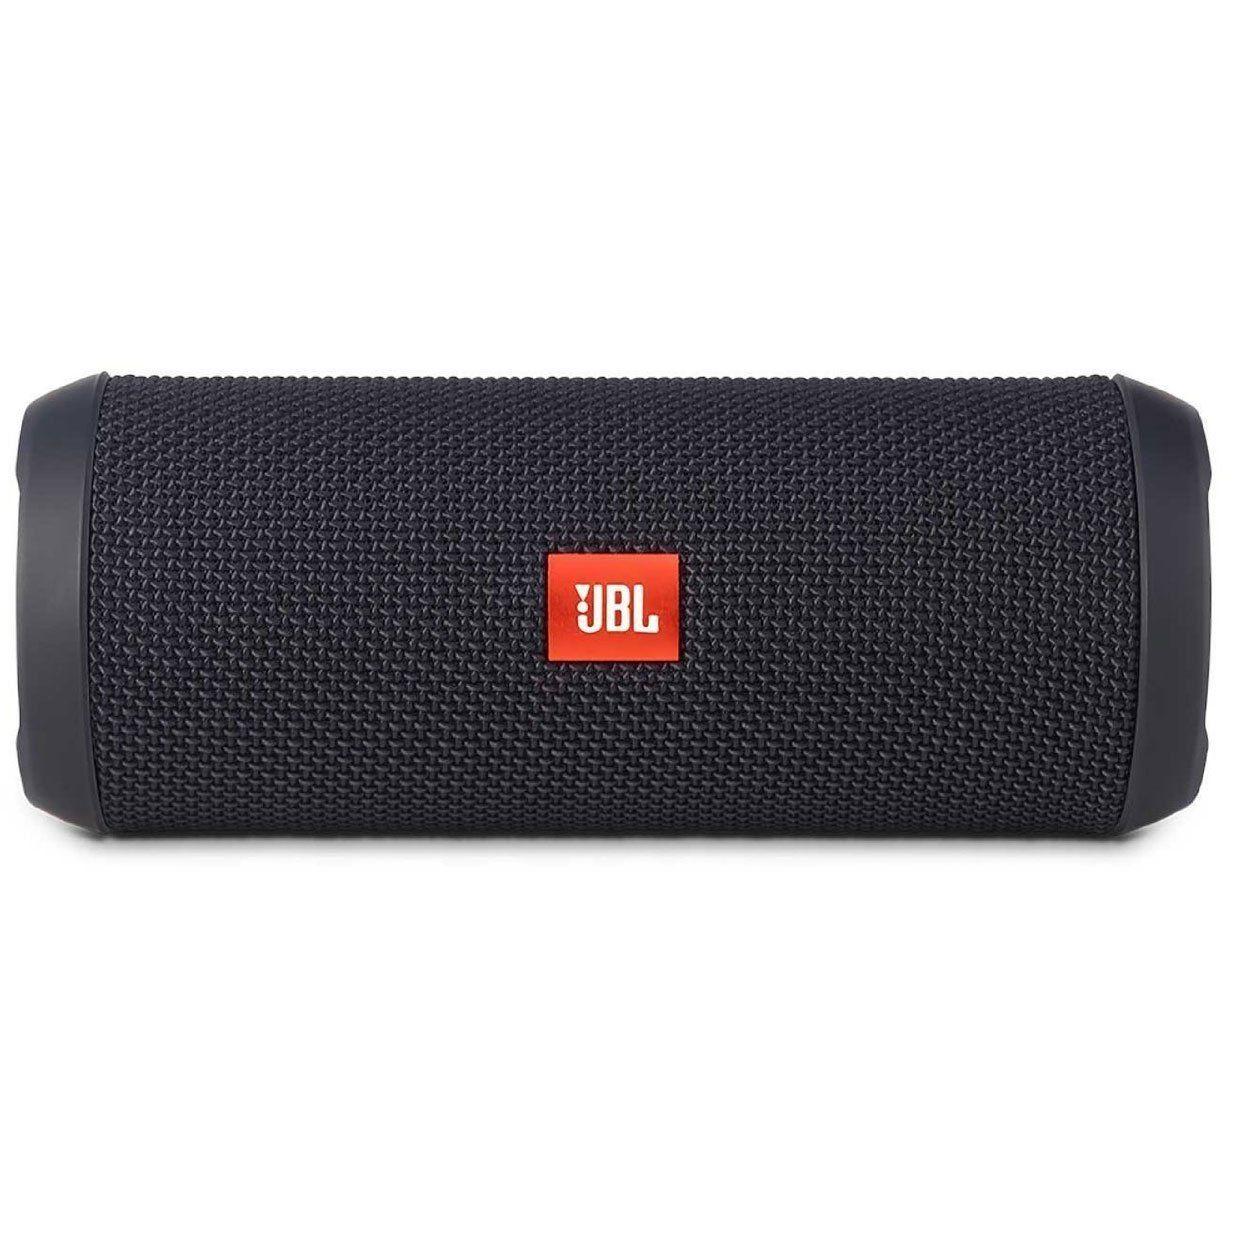 Amazon.com: JBL Flip 3 Splashproof Portable Bluetooth Speaker, Black: Home Audio & Theater